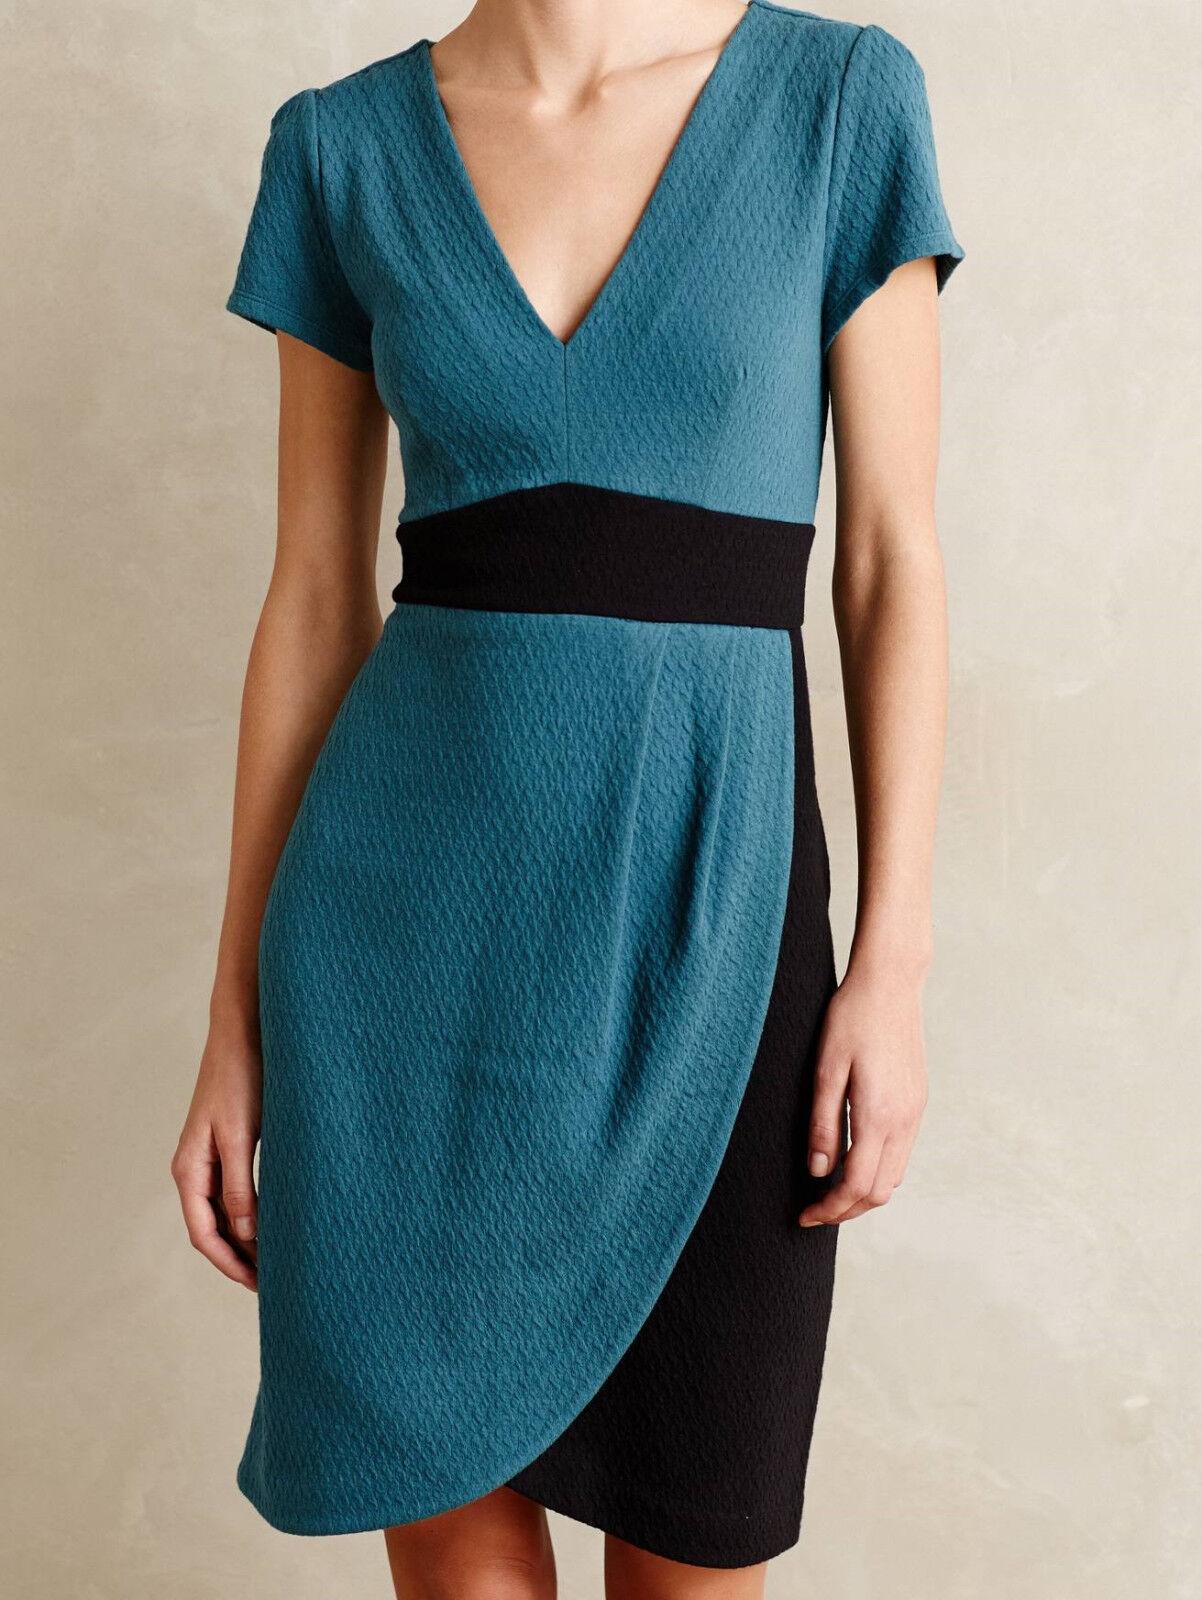 Maeve Splitshade Tulip Hem Dress Size XS, M, L, XL Turquoise NW ANTHROPOLOGIE Ta